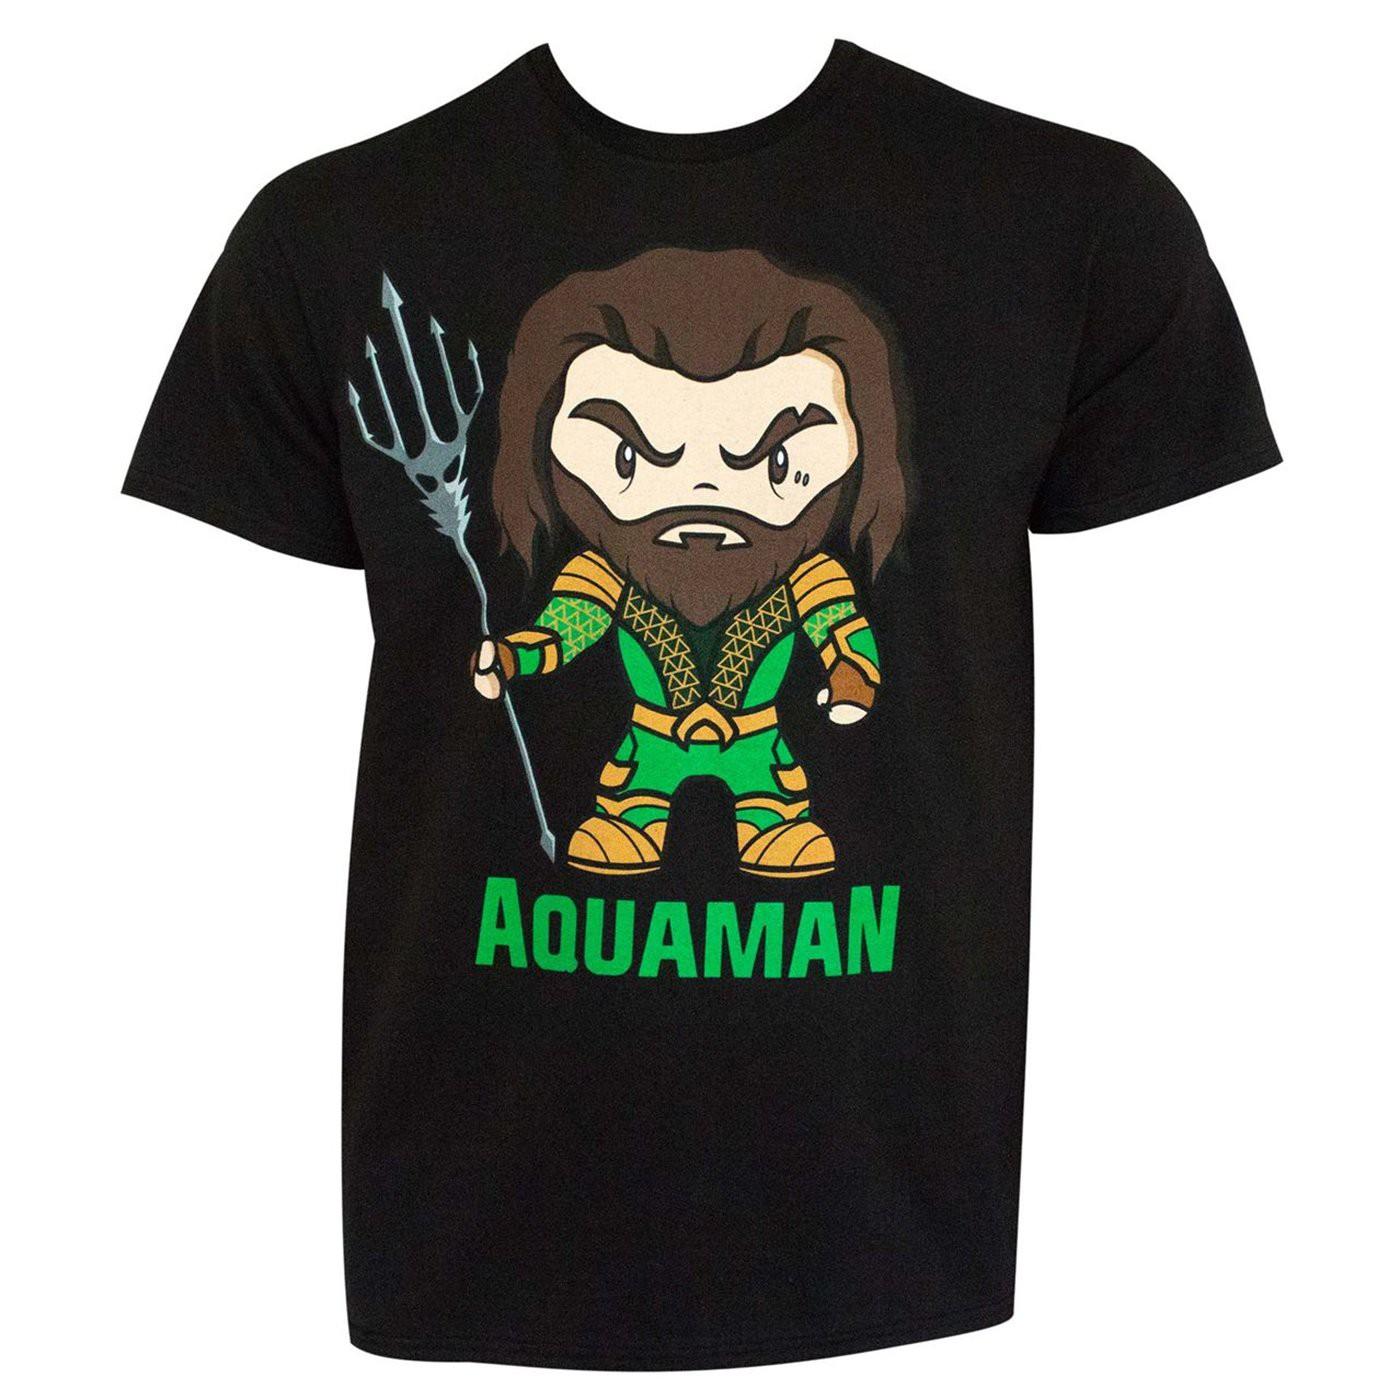 Aquaman Movie Cartoon Men's T-shirt